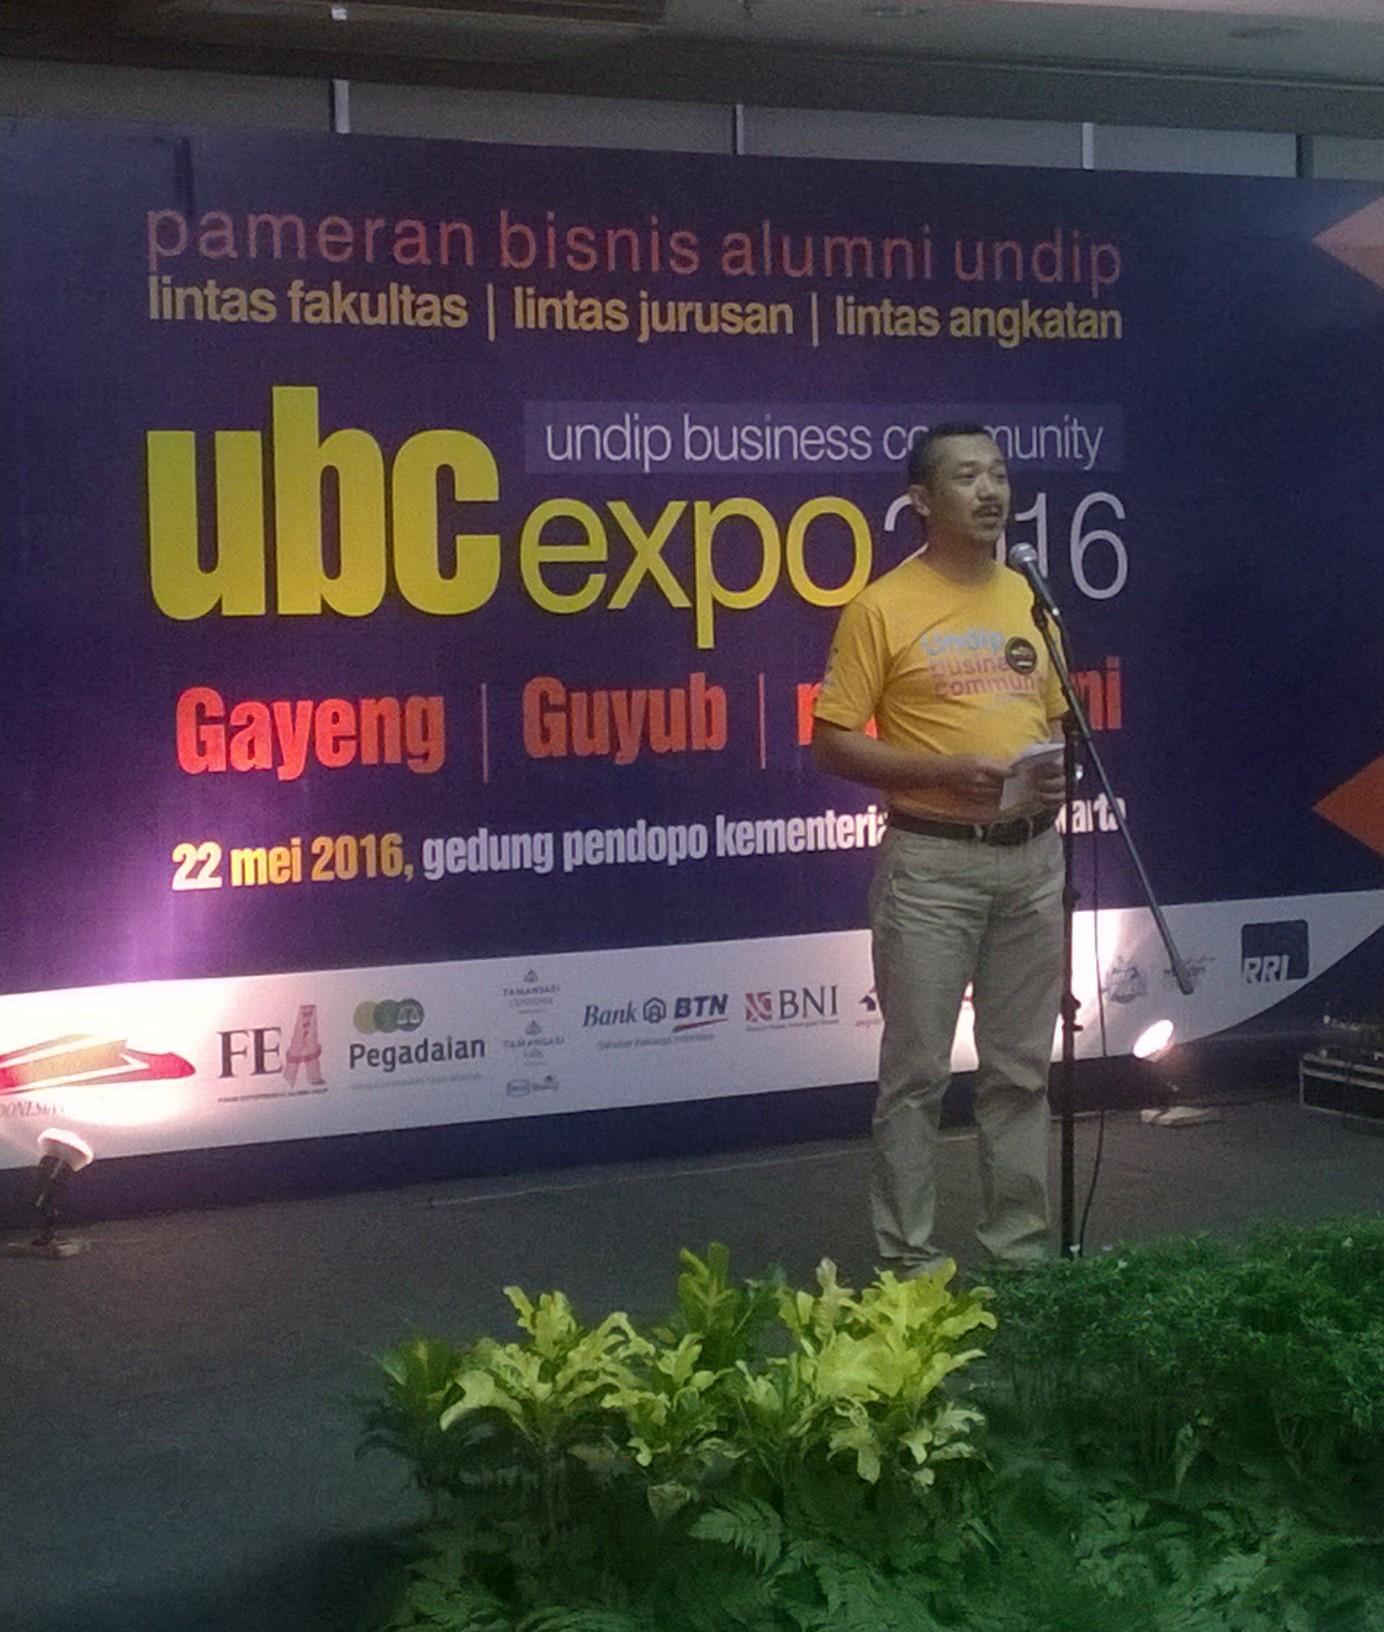 UBC Expo 2016 Berdayakan Entrepreneur UNDIP Untuk Indonesia Maju